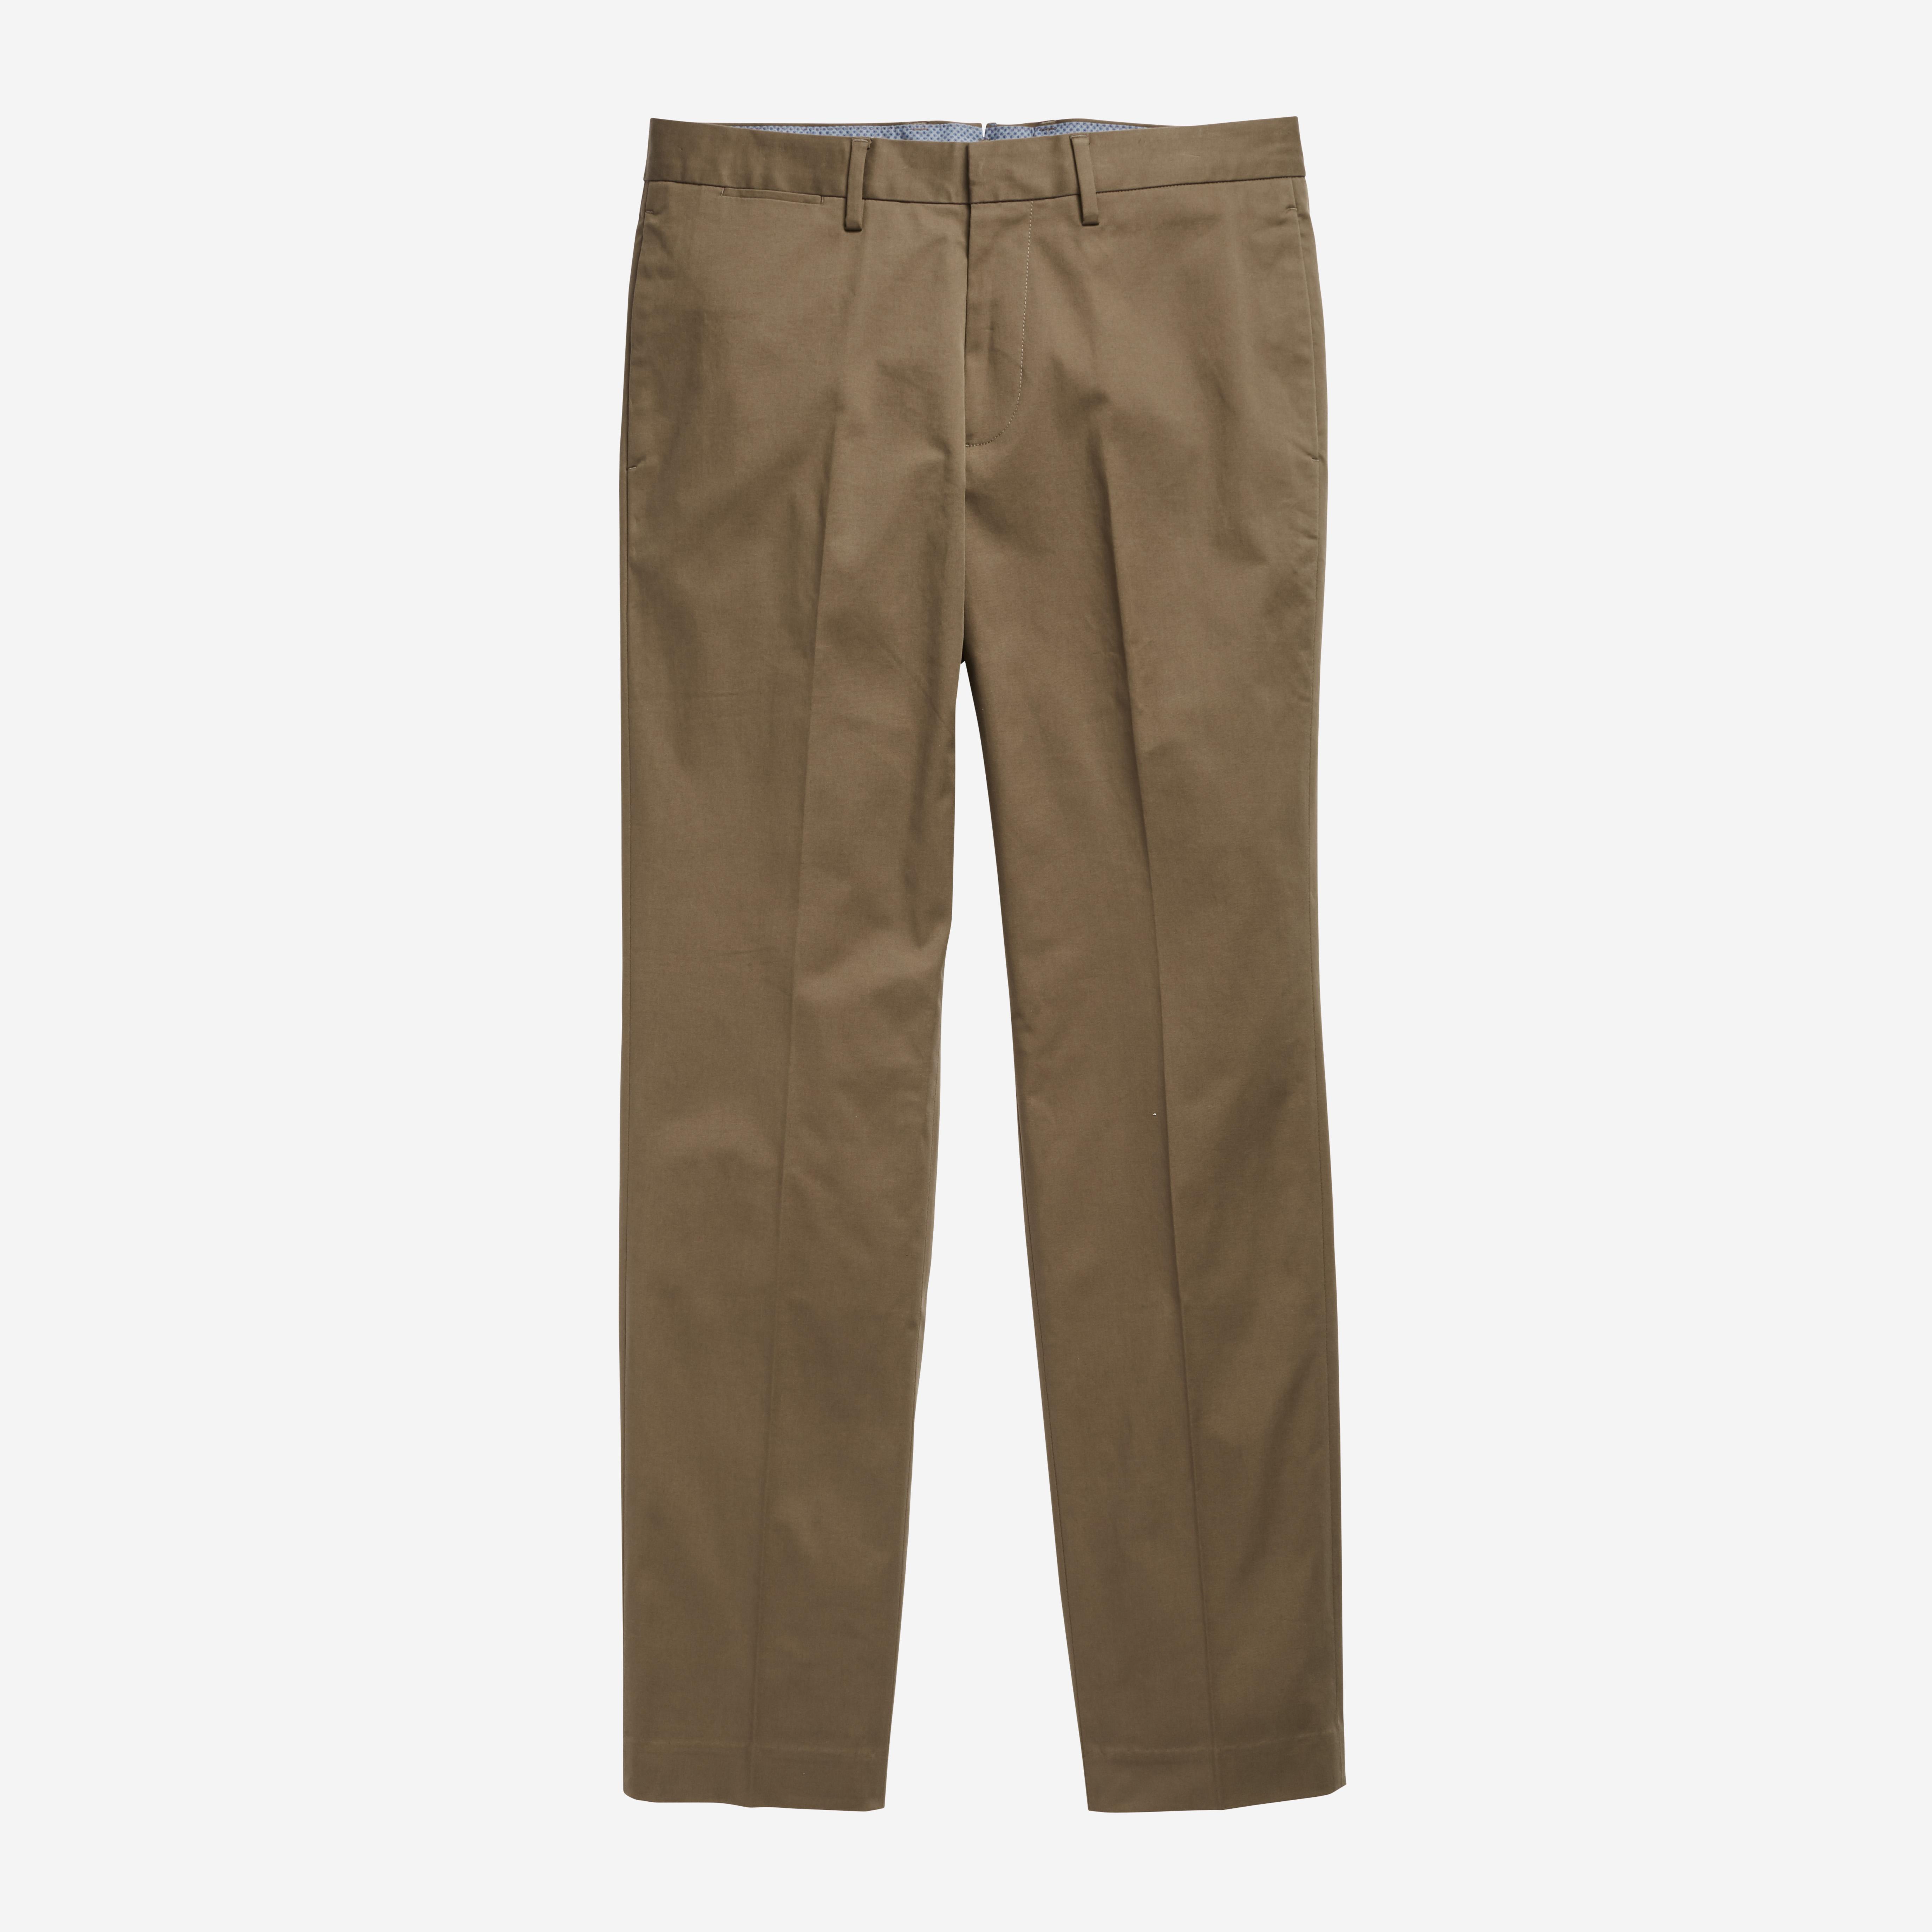 38 Waist 30 L George Mens Microfiber Performance Flat Front Dress Pants Black